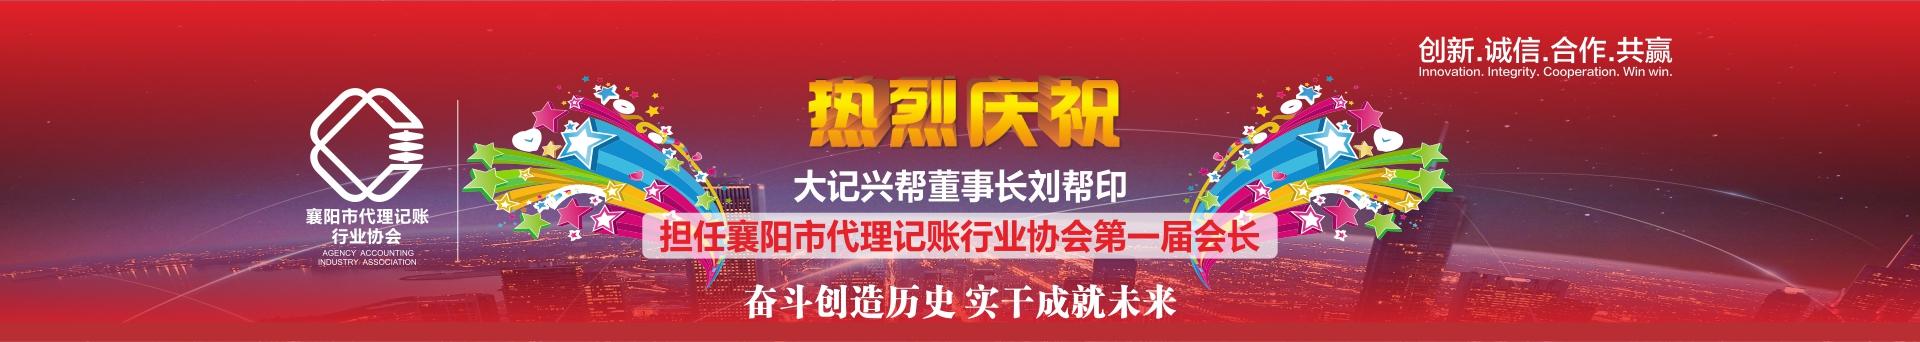 PC-首頁banner1